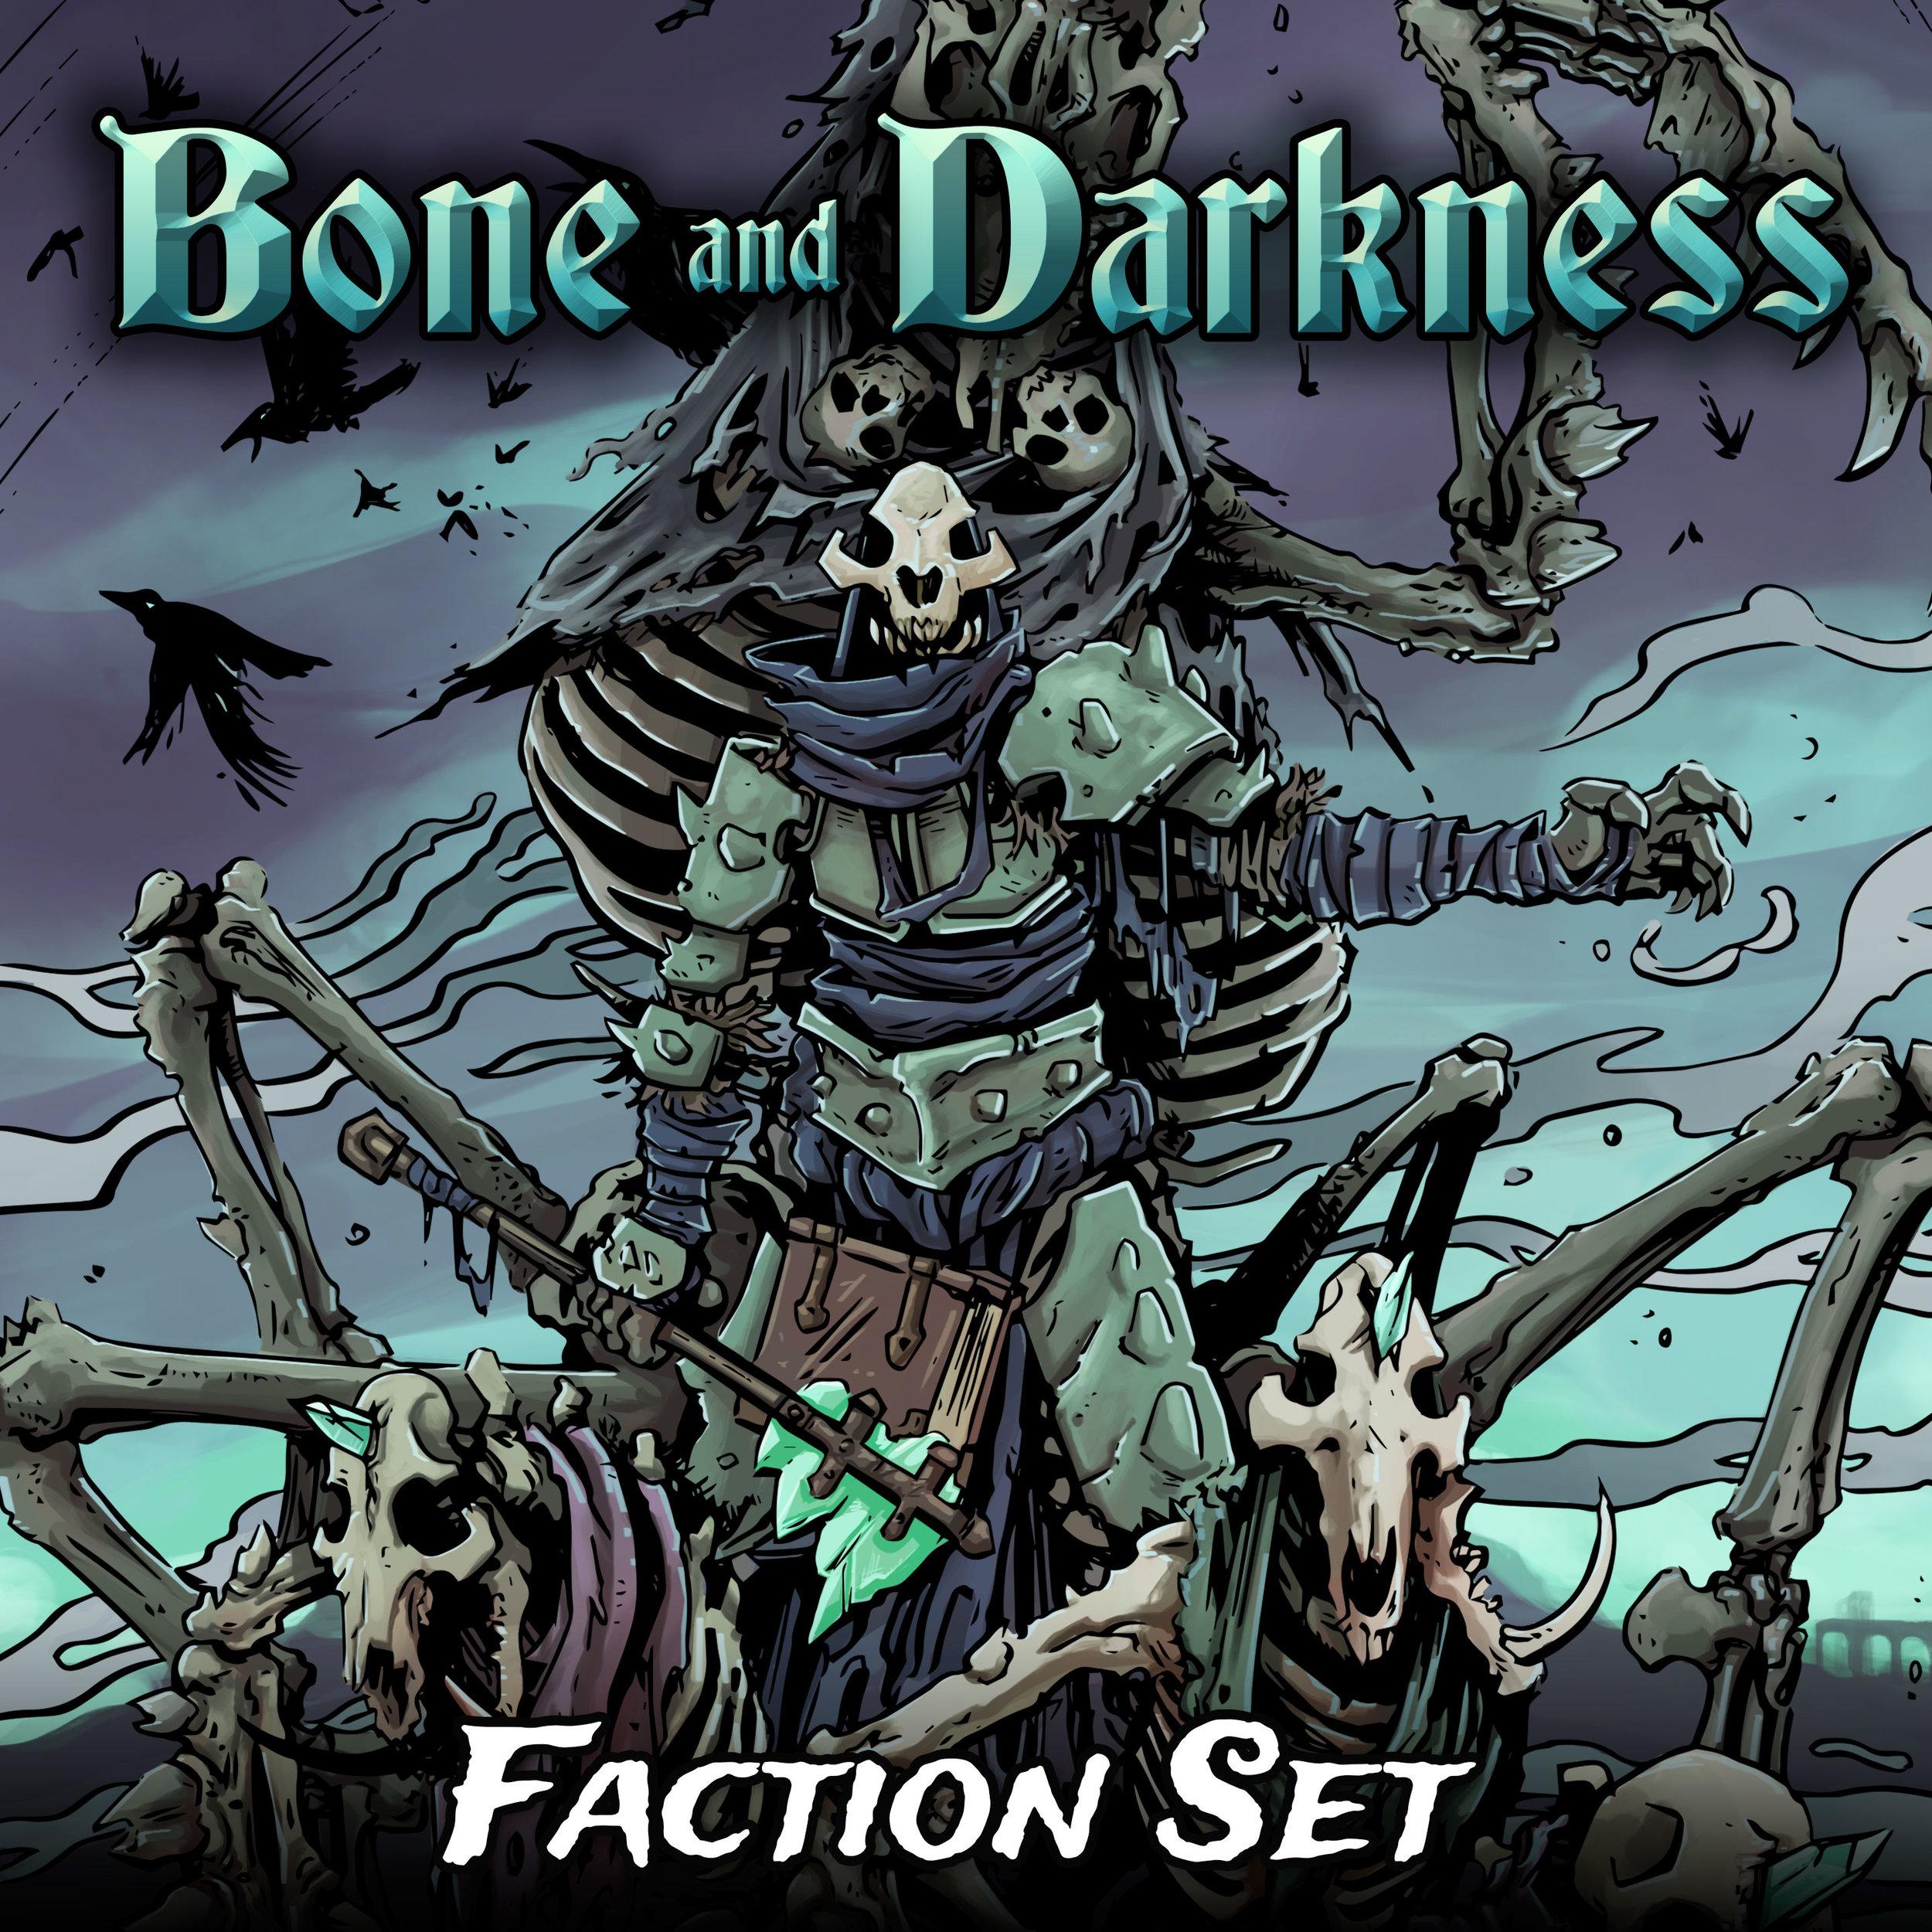 Bone-and-Darkness-Faction-Set.jpg